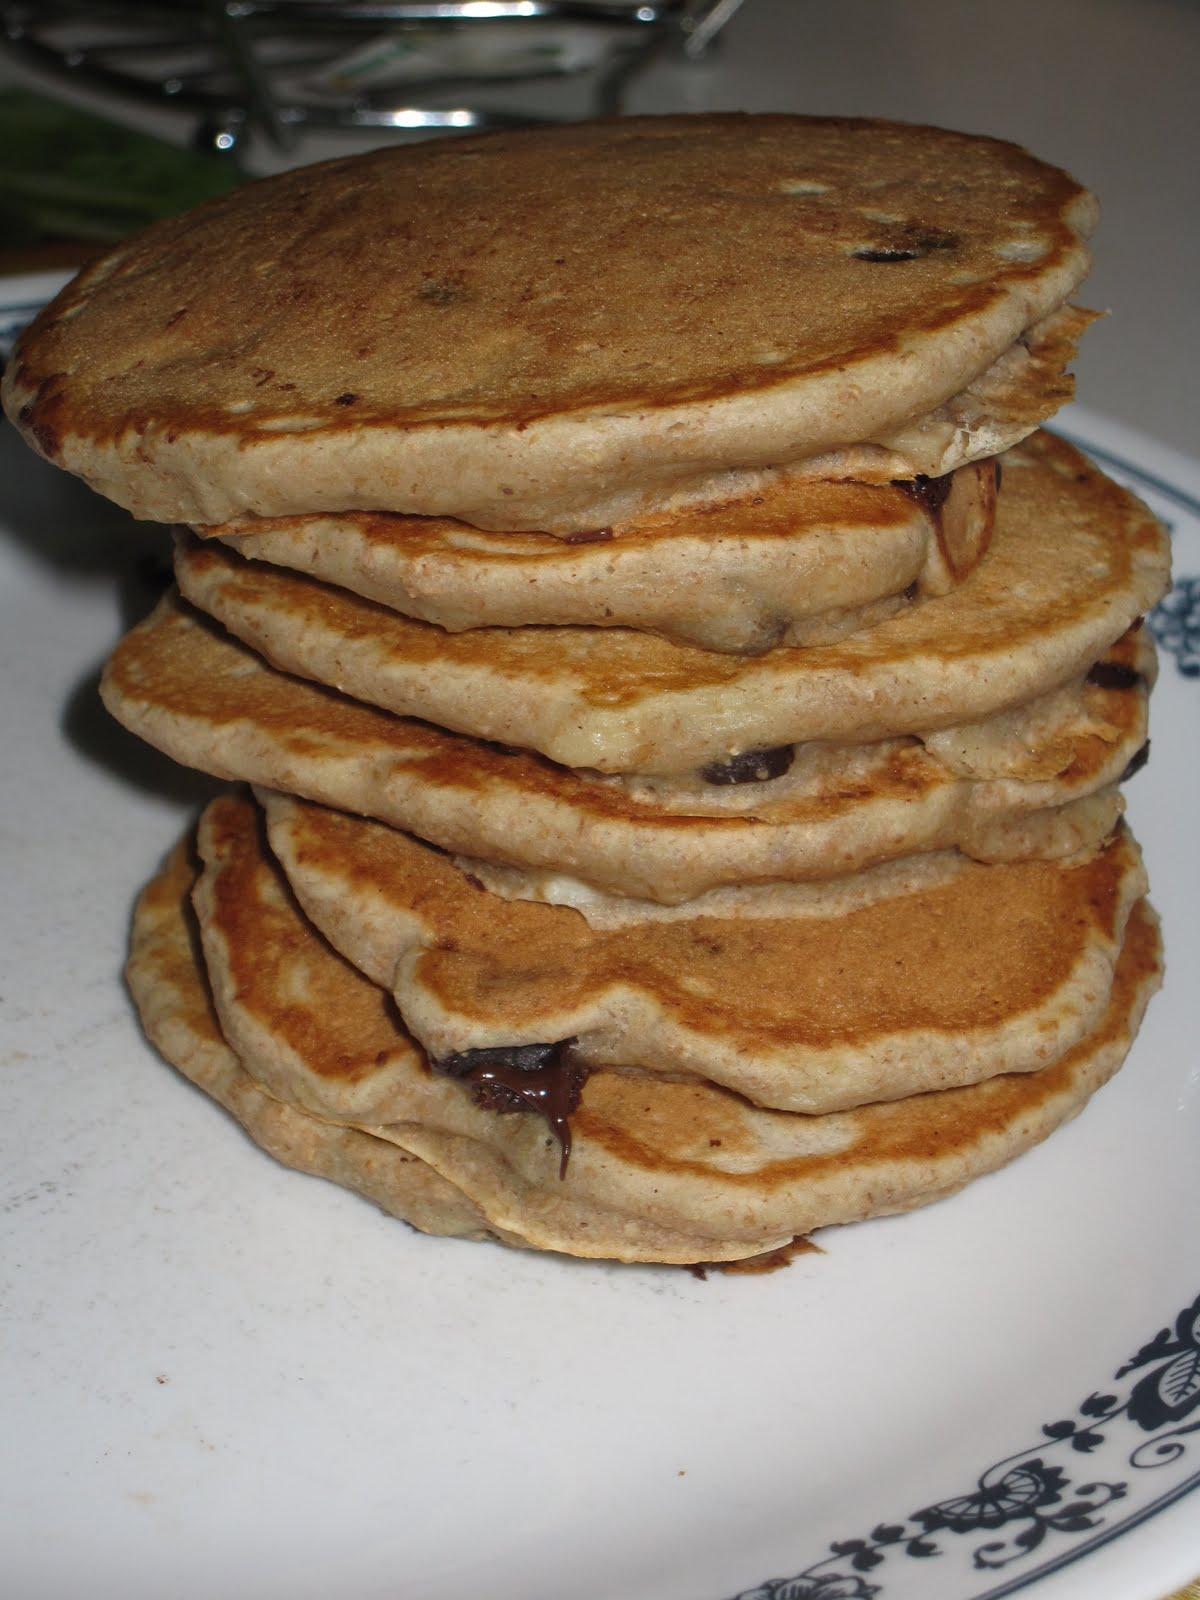 Whole Wheat Banana Chocolate Chip Pancakes - She Bakes Here